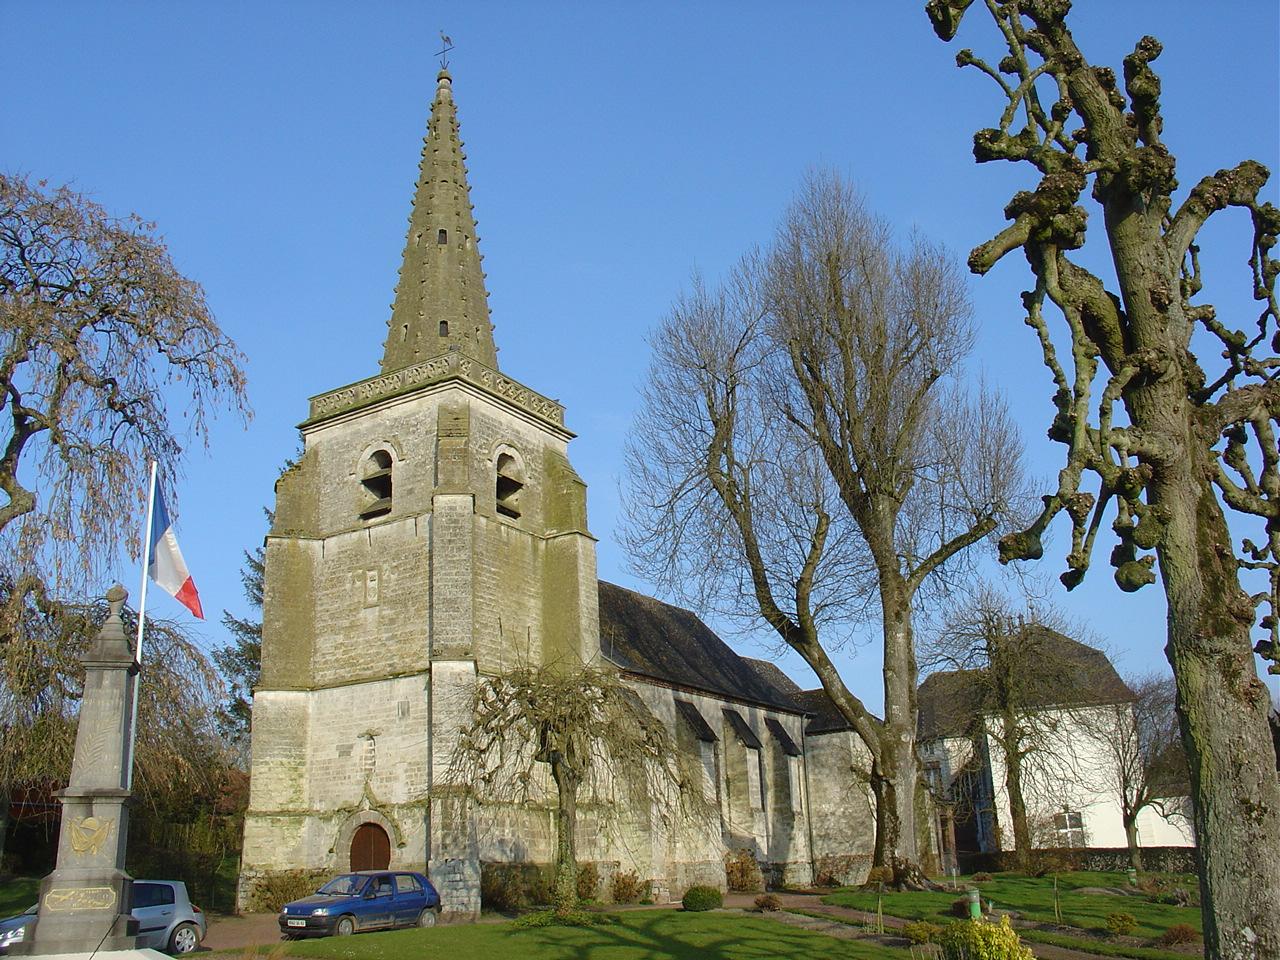 Boubers-sur-Canche